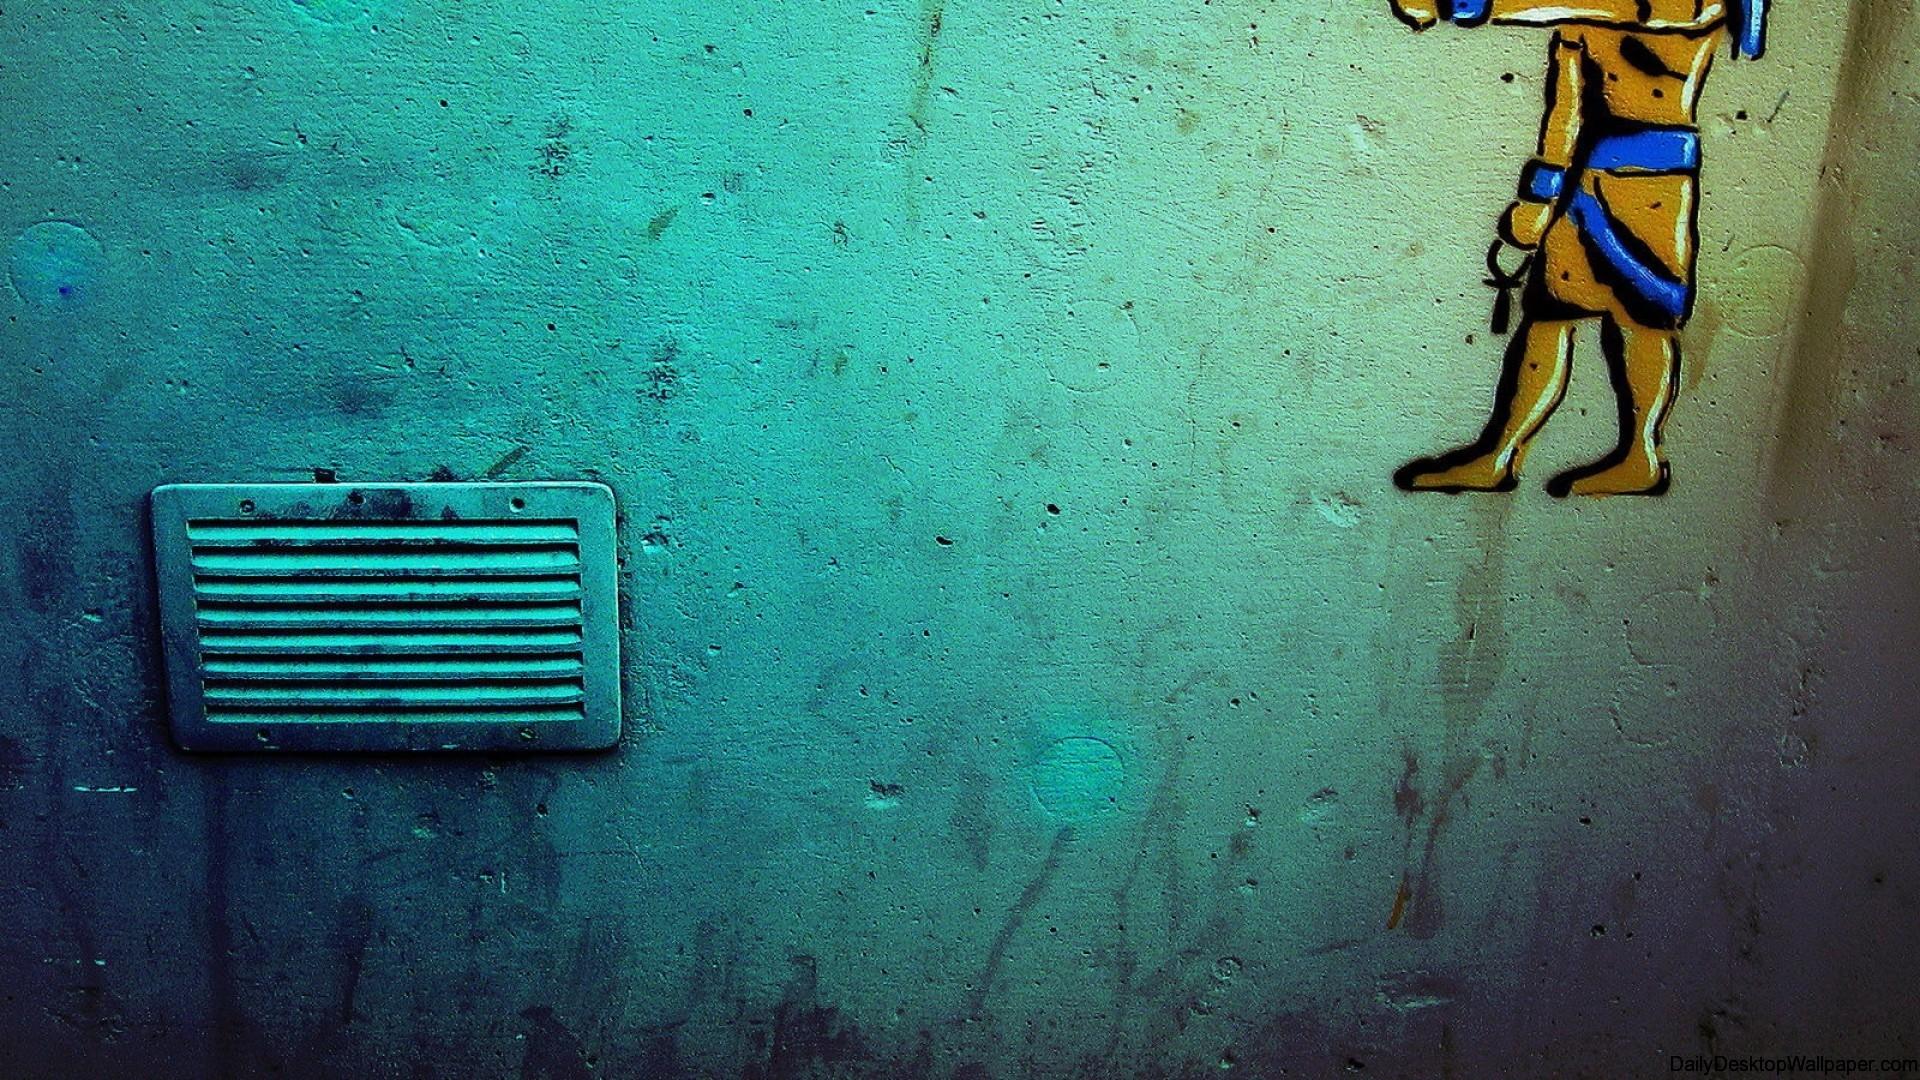 Wallpaper For Pc Desktop Free Download Car Funny Egyptian Wallpaper Hd Wallpapers